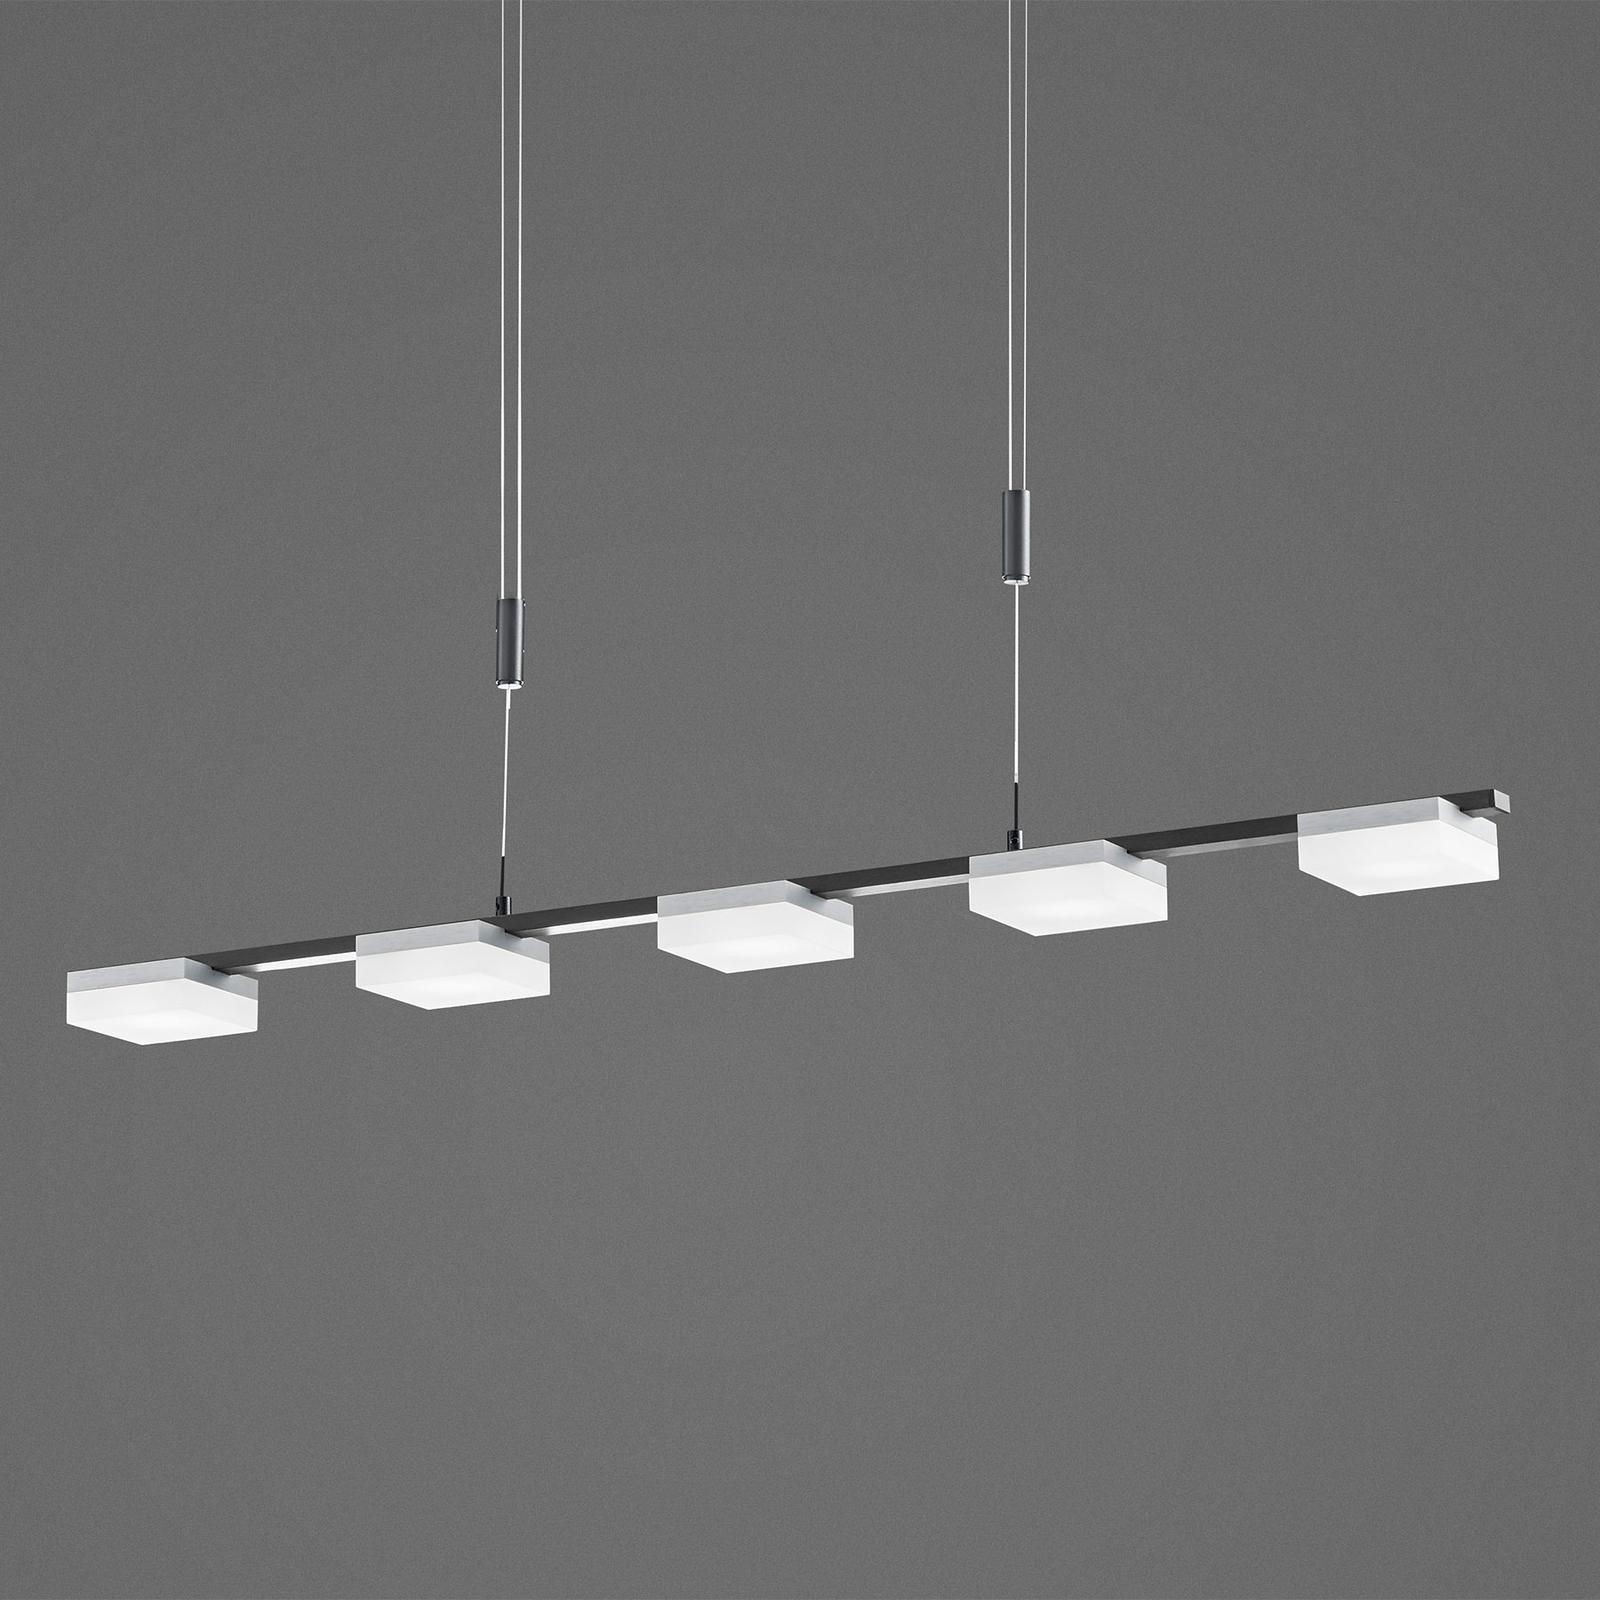 Bopp Quad LED-Hängelampe fünfflammig schwarz/alu